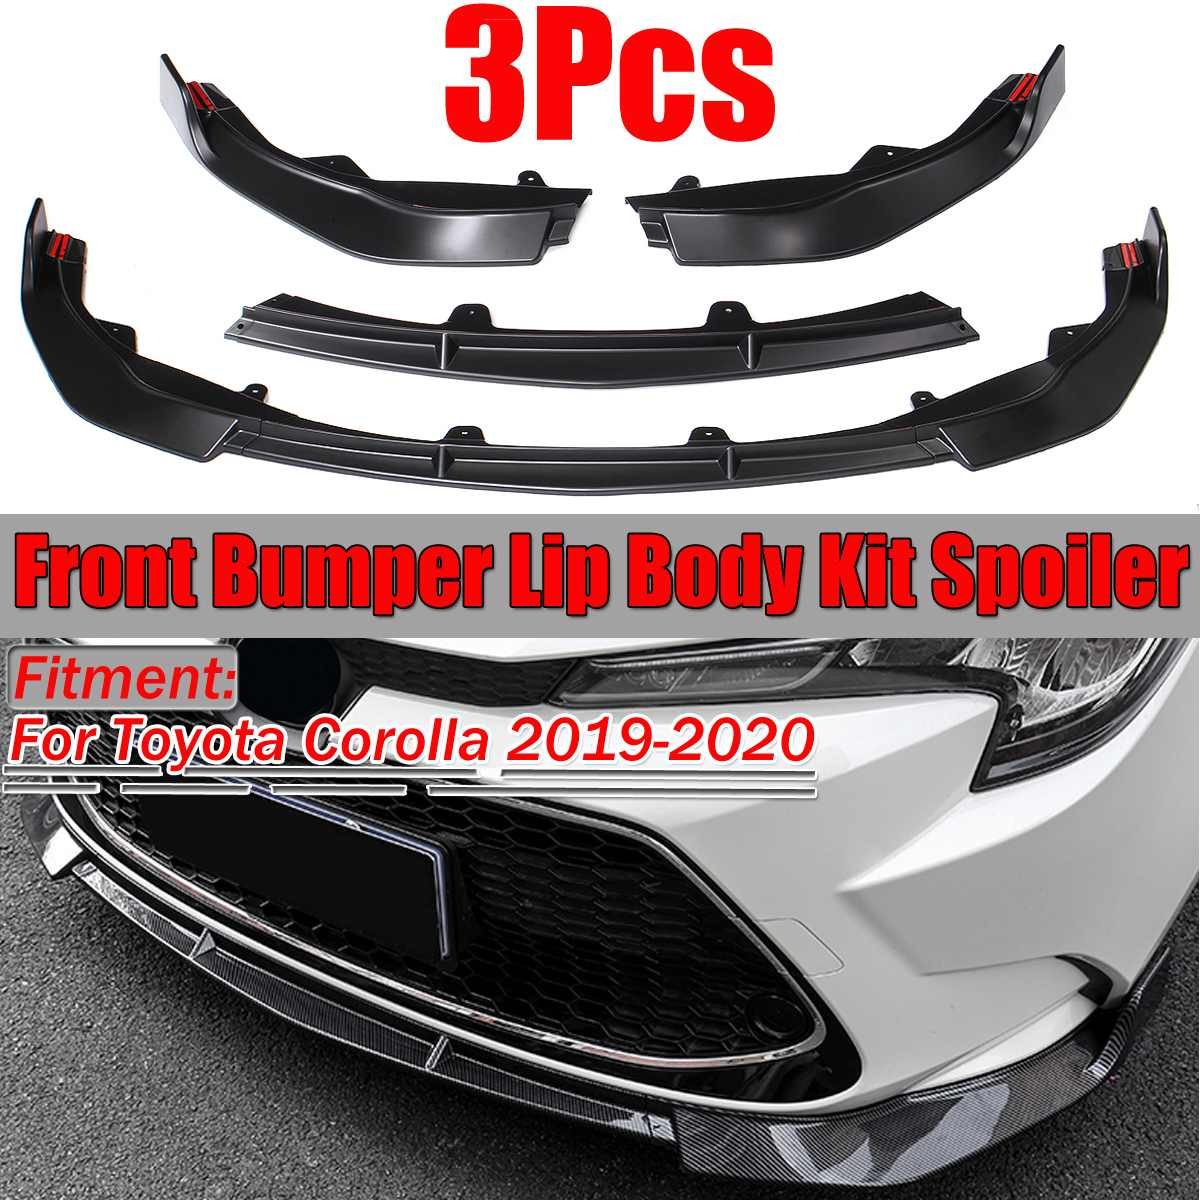 For 2009 2010 Toyota Corolla S Style Front Lower Body Kit Bumper Lips Spoiler